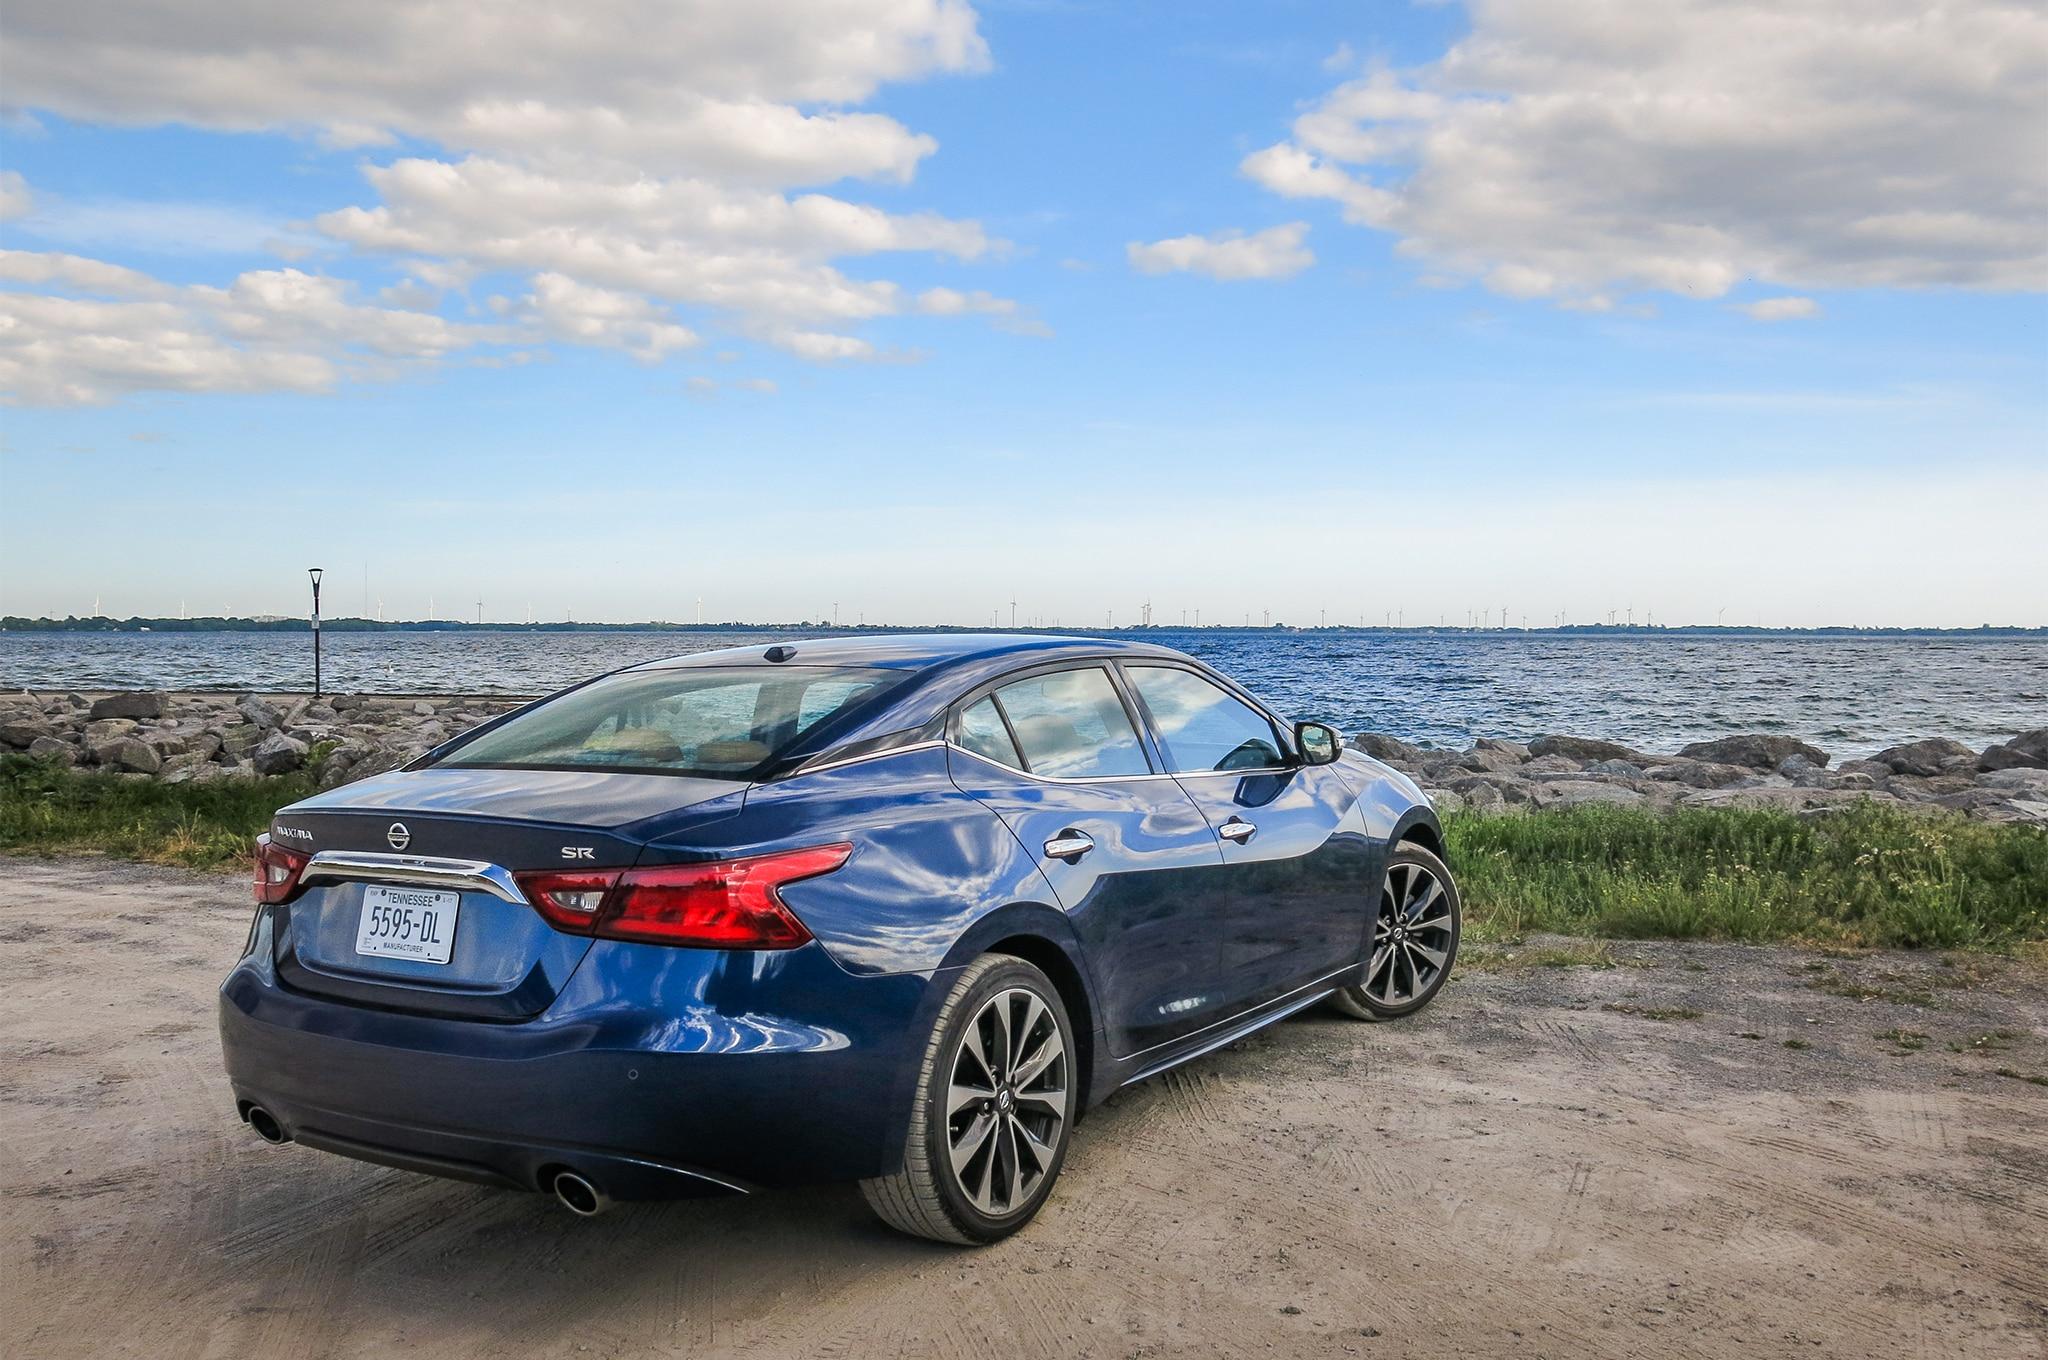 Four Seasons 2016 Nissan Maxima SR Update 4 Escape to